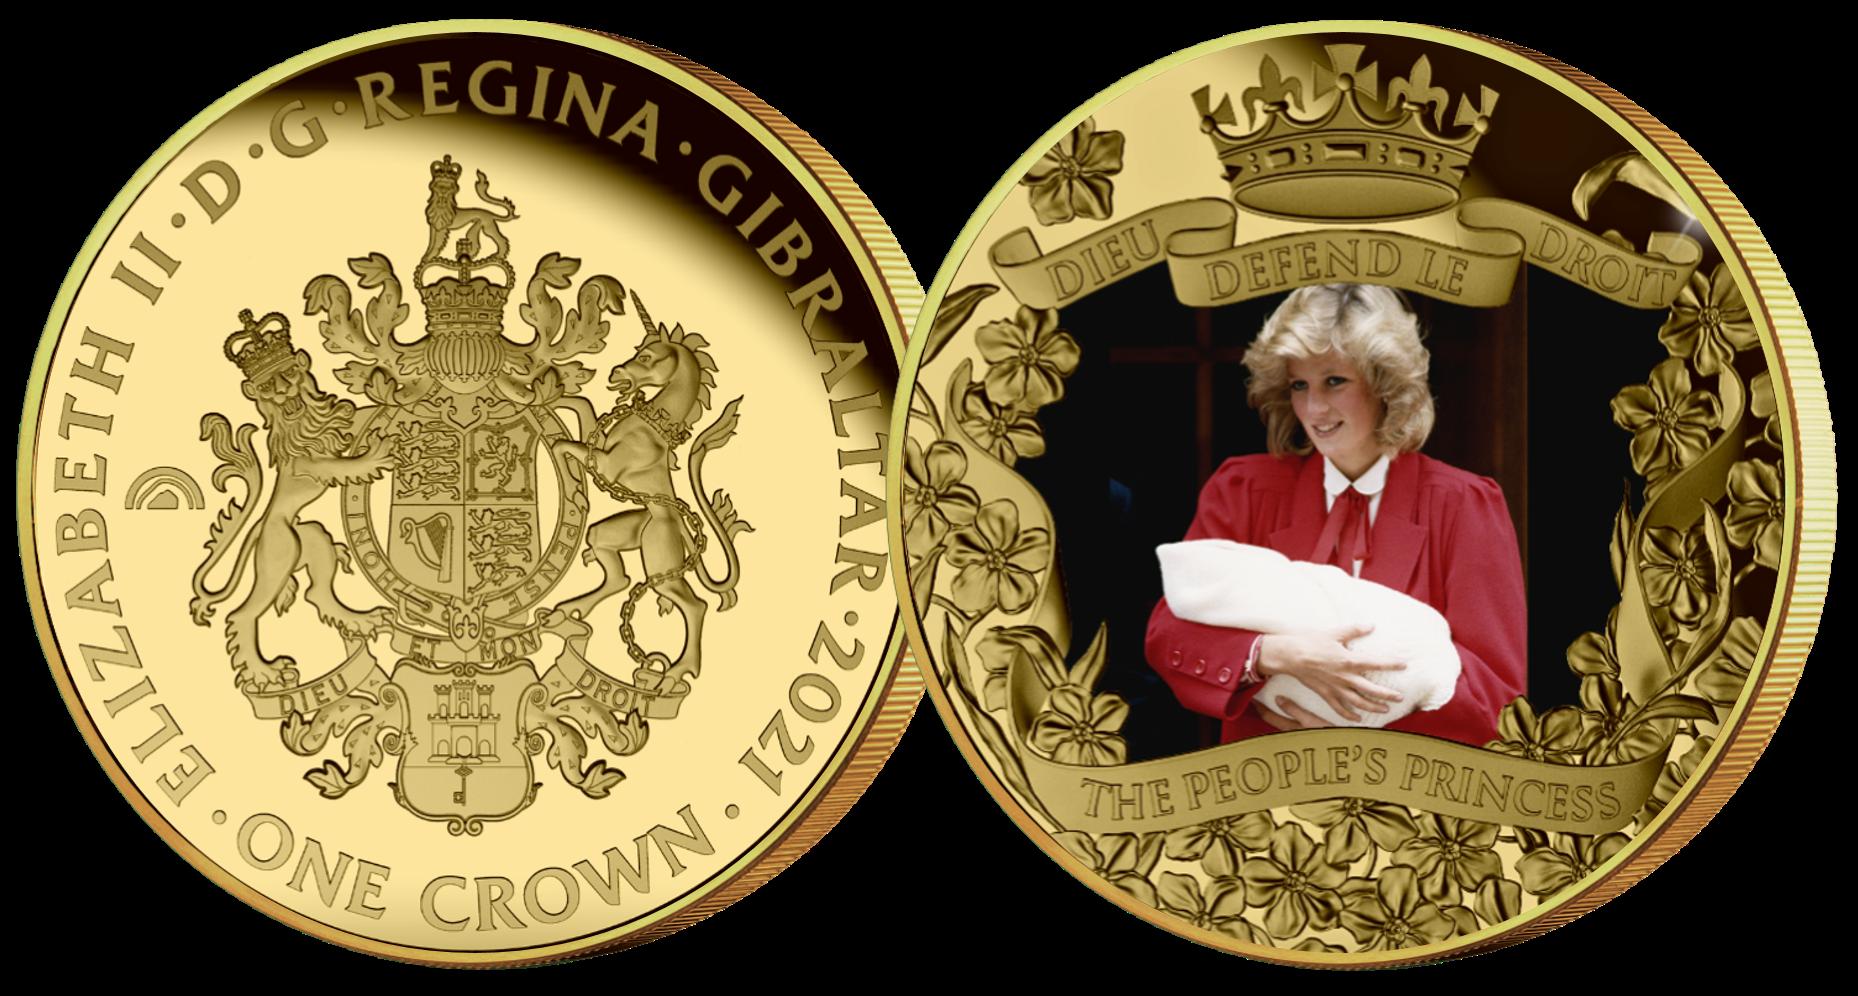 Koop munten online | Fairmined verguld | Diana